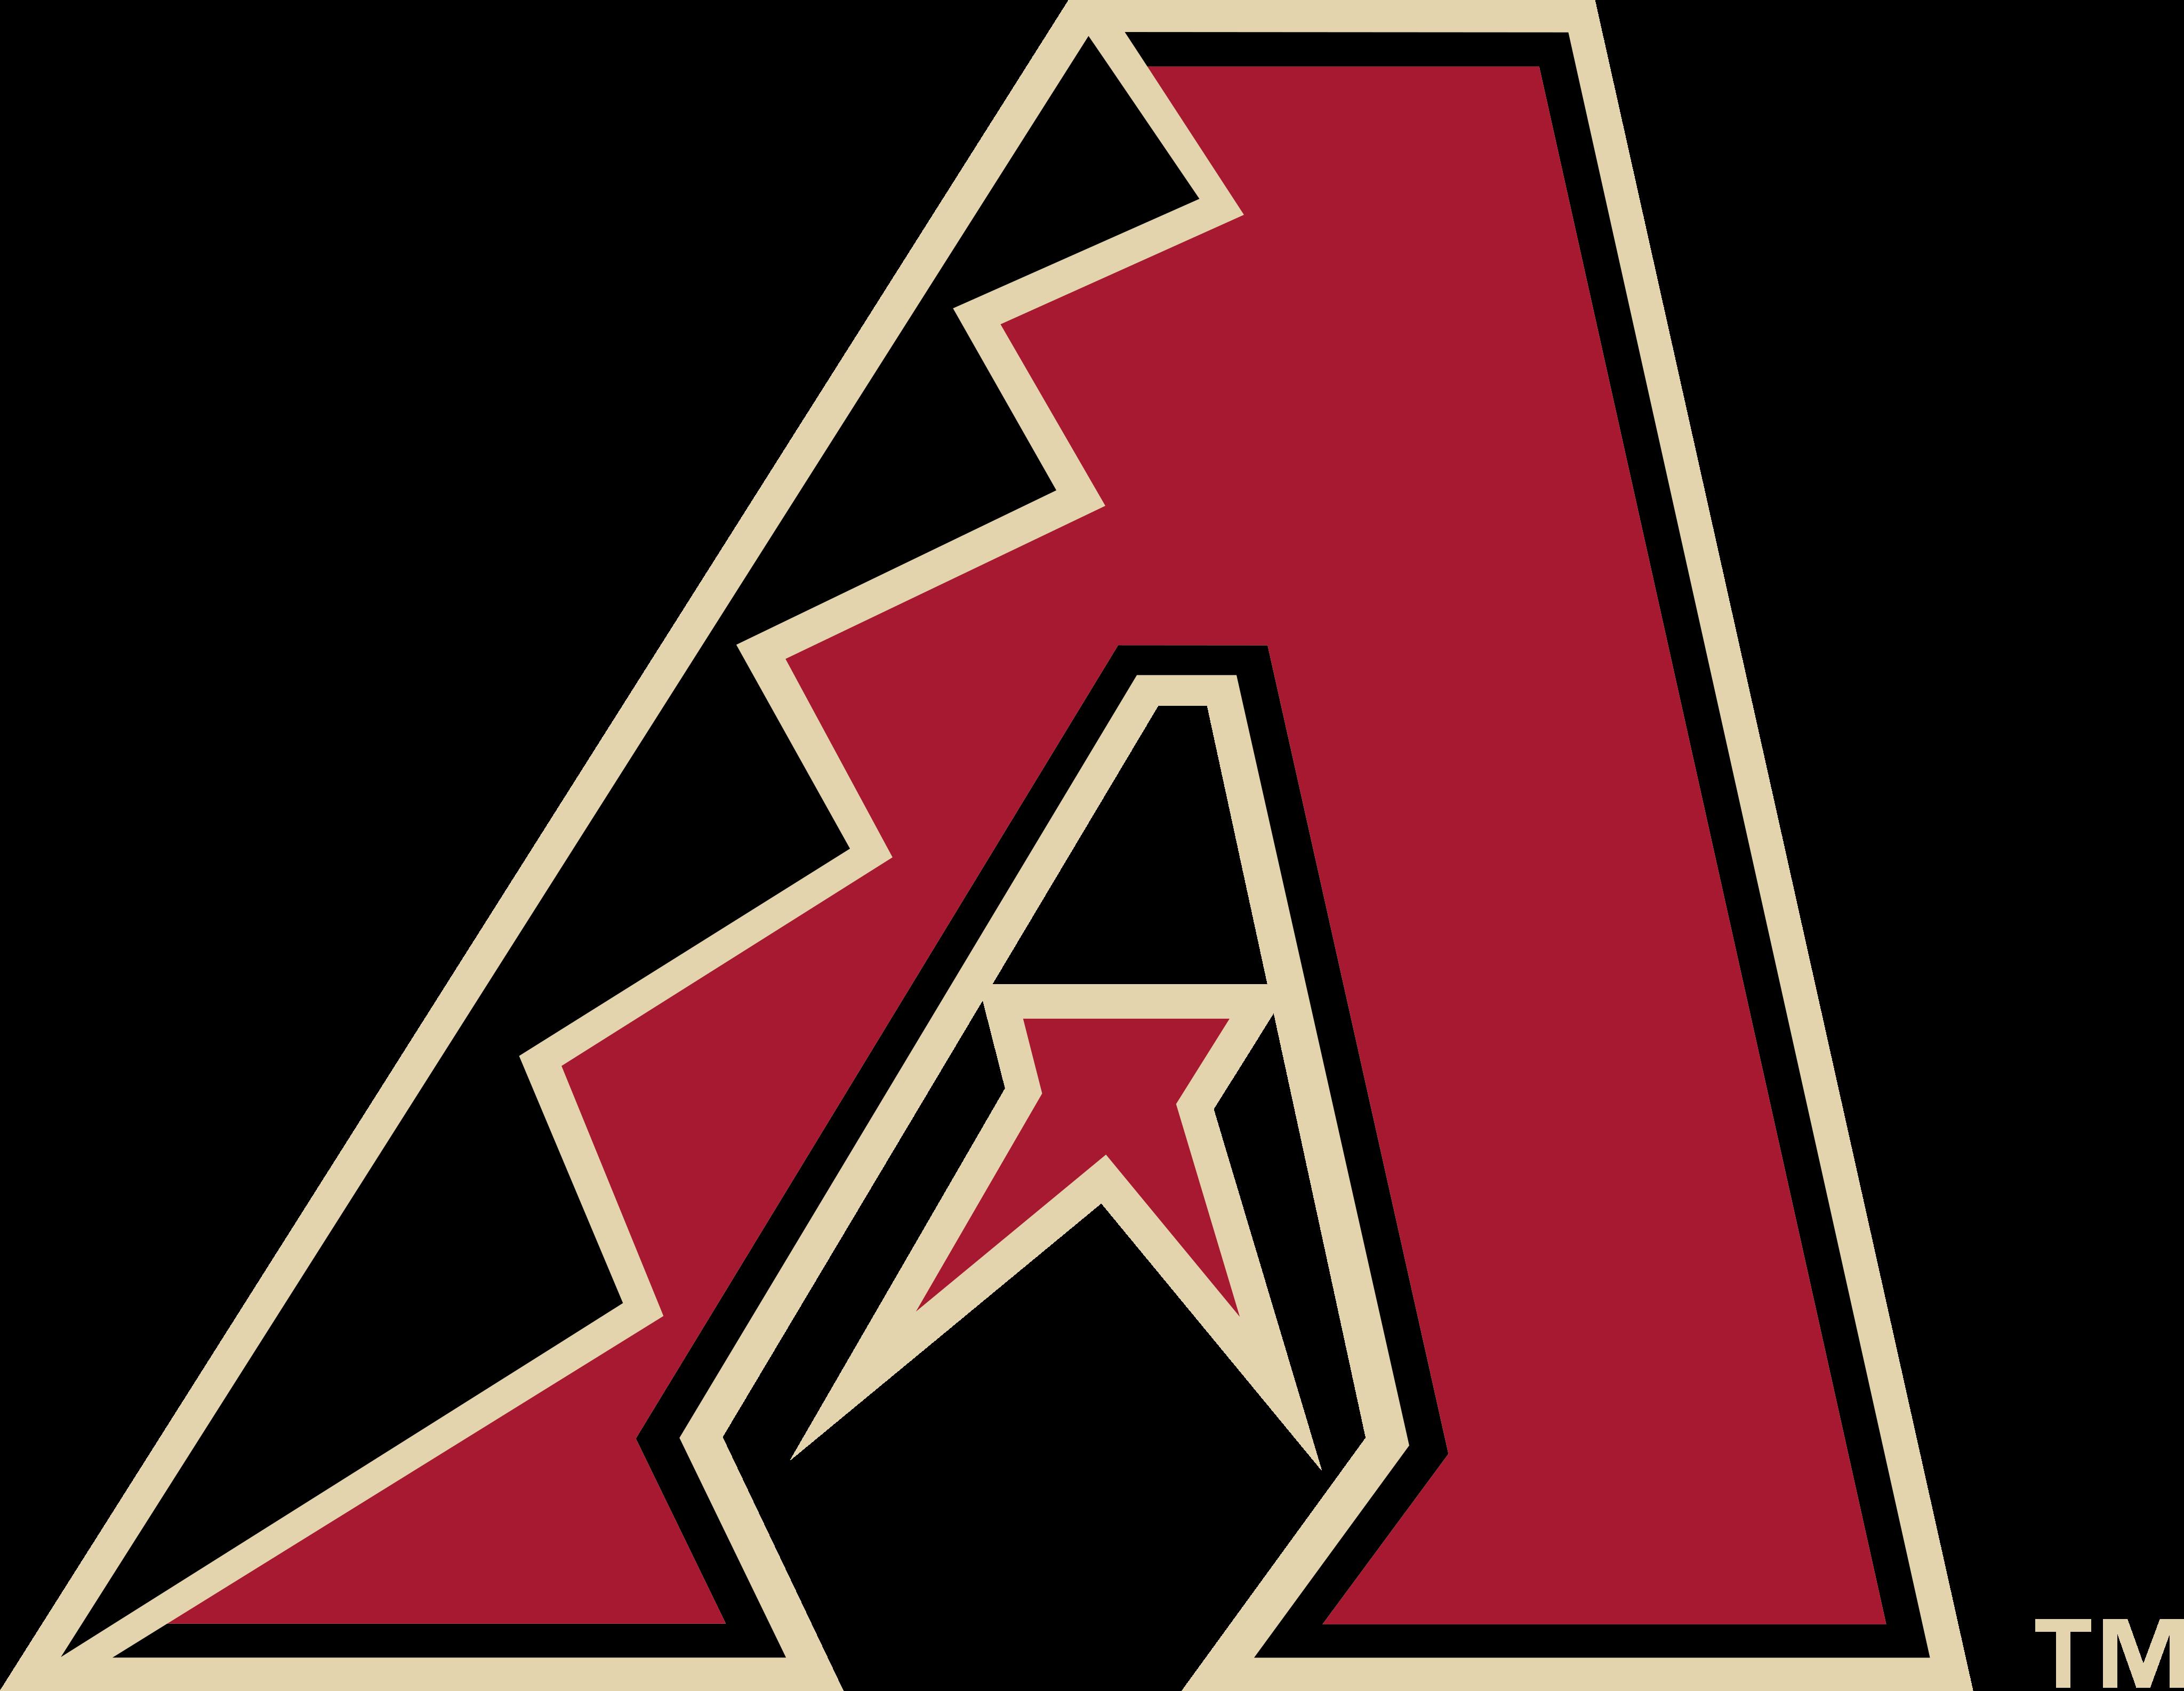 arizona diamondbacks logo - Arizona Diamondbacks Logo